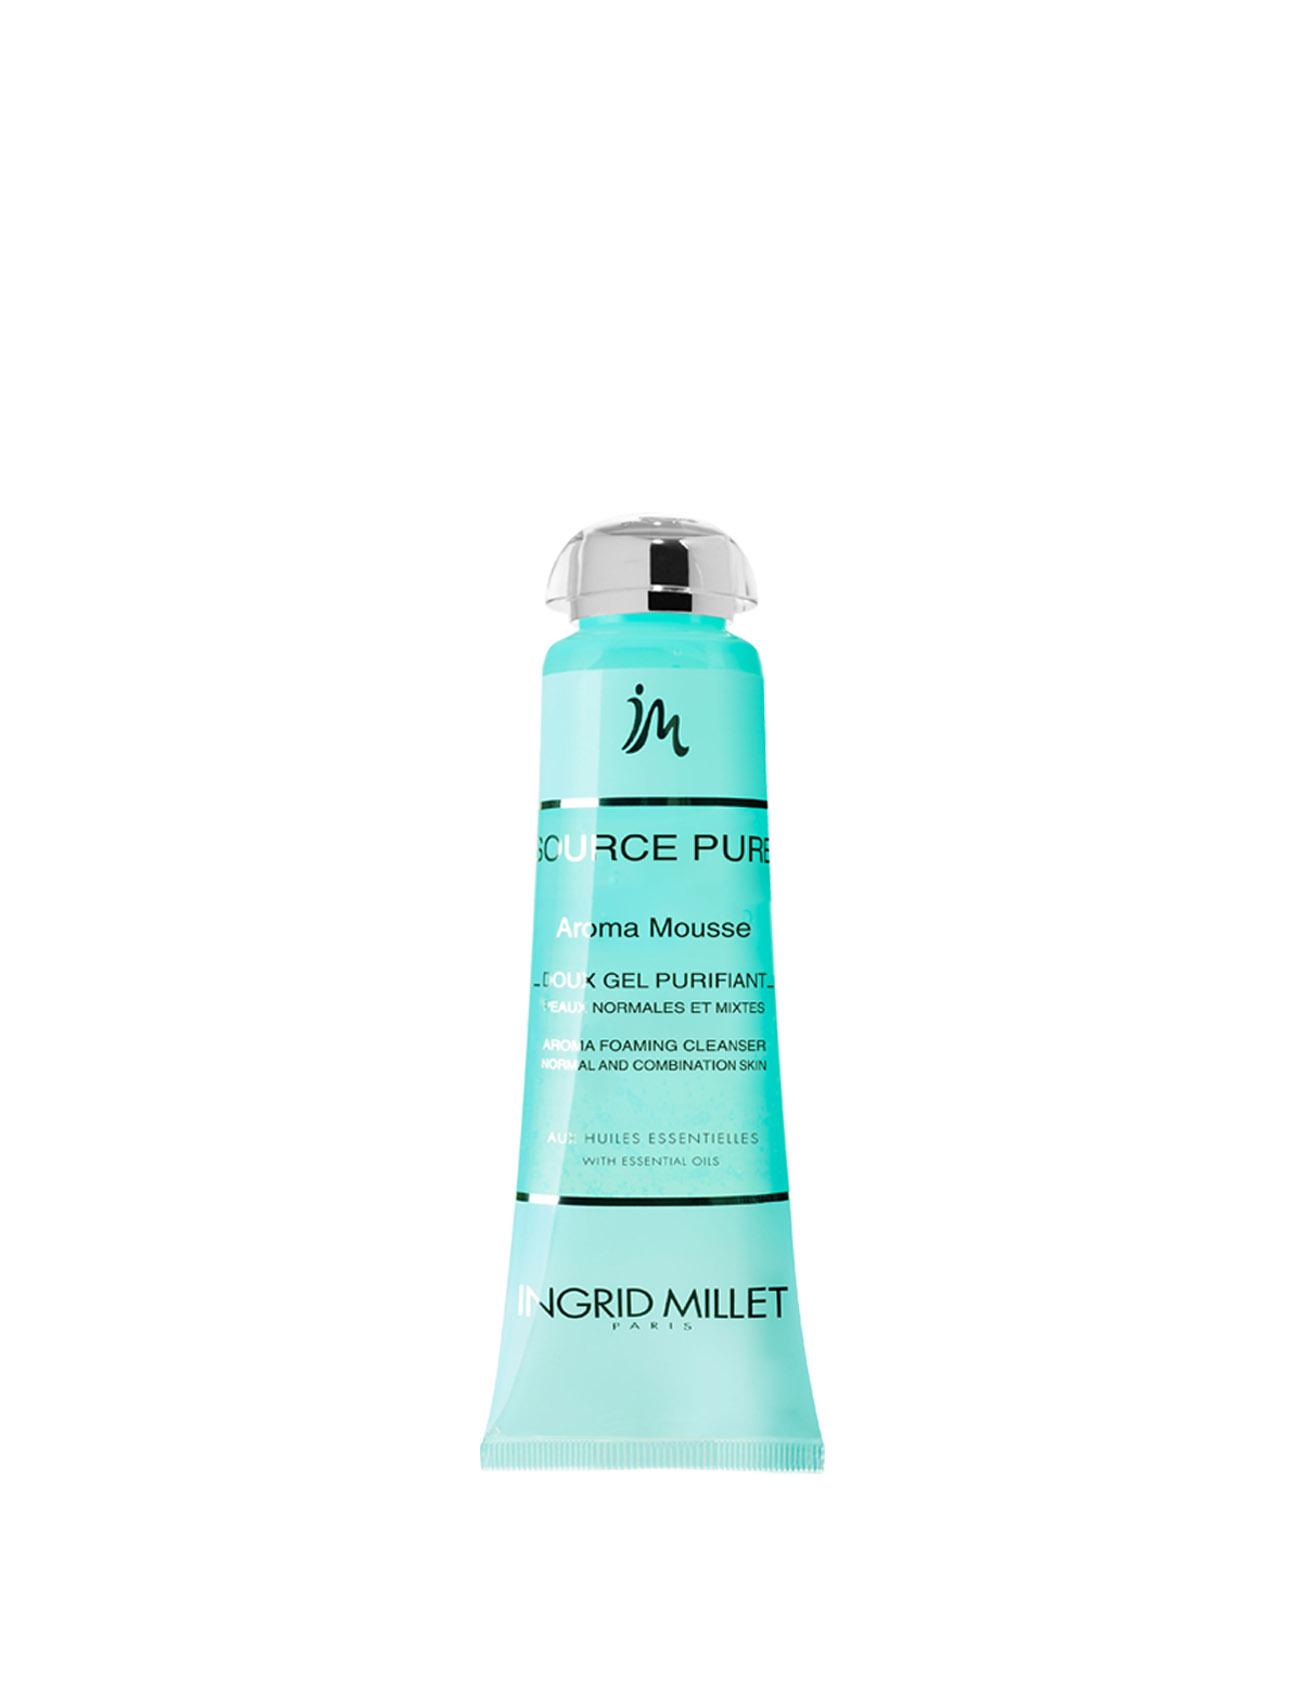 6-Aroma-Mousse-Gel-purificante-Ingrid-Millet-Linea-cosmetici-di-lusso-Source-Pure-Dispar-SpA.jpg